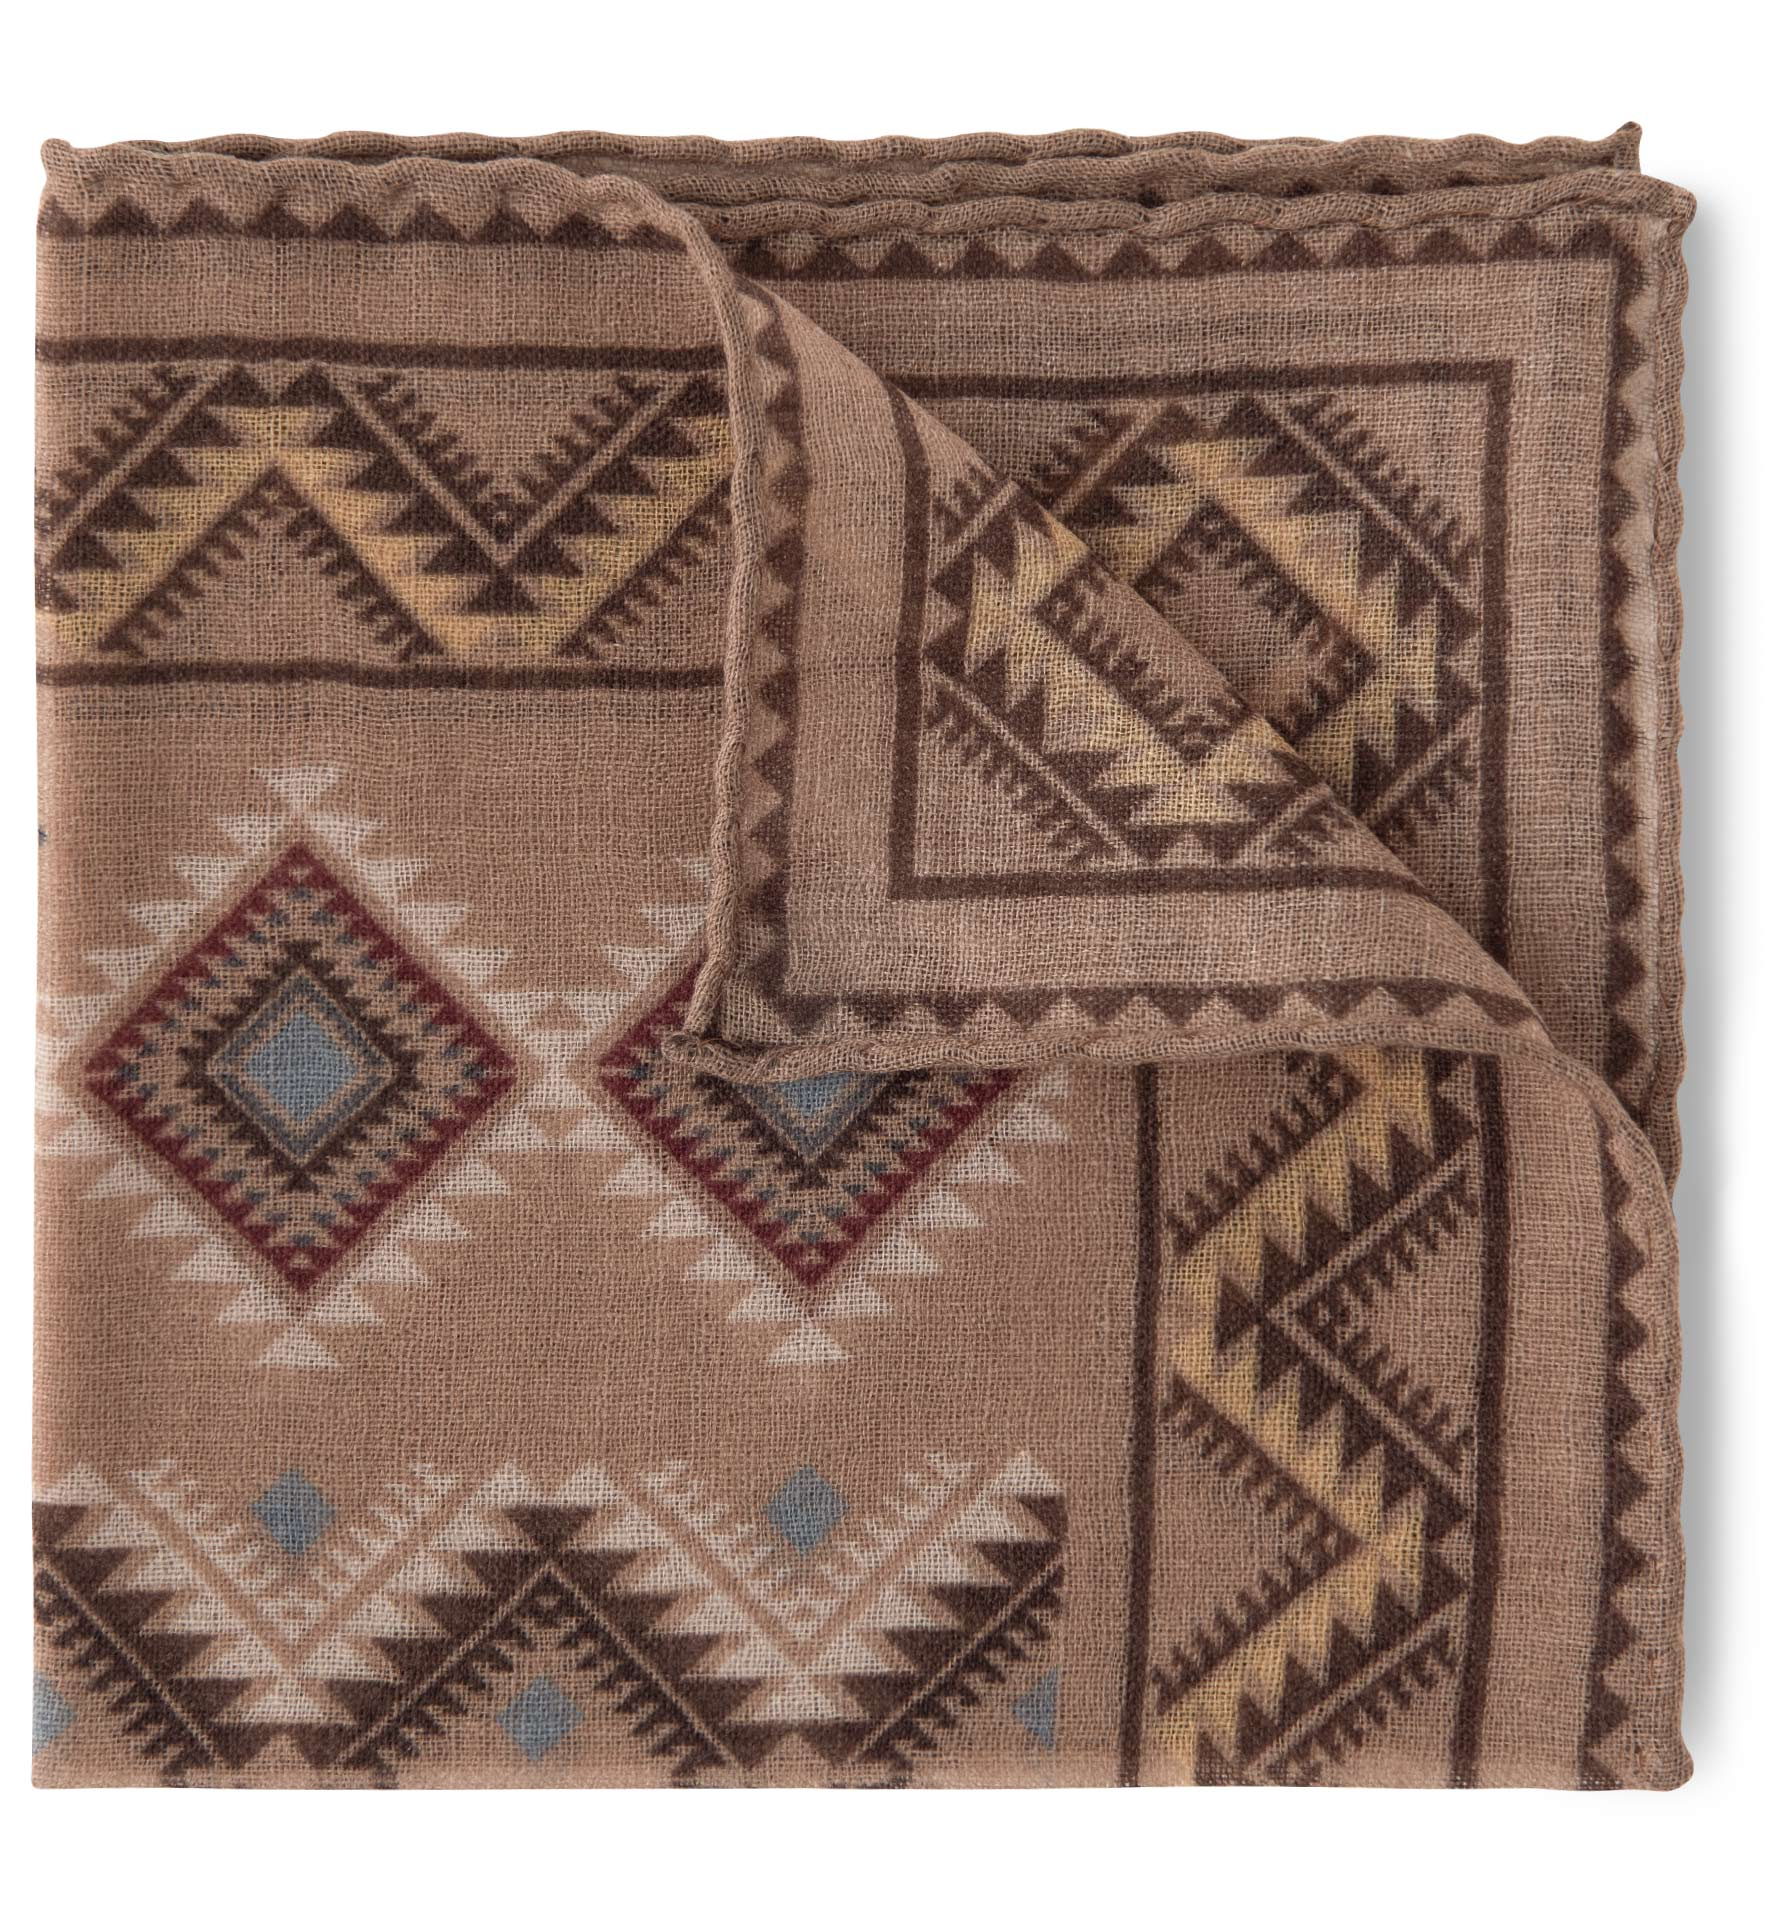 Zoom Image of Caramel Southwest Print Wool Pocket Square